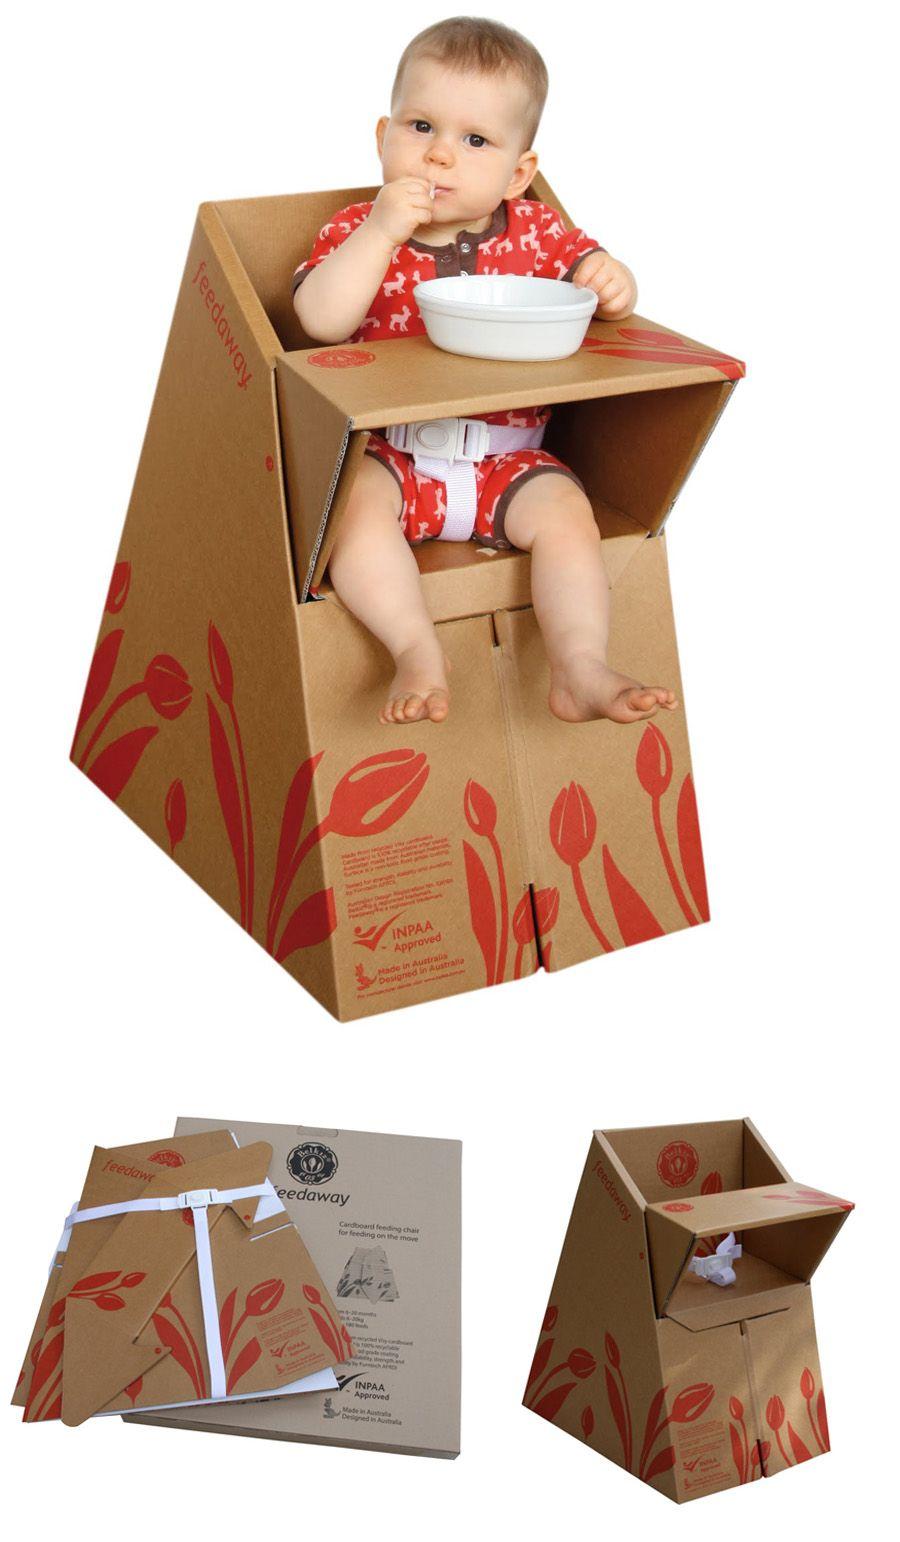 Sillita de cartón para bebés (Feedaway) | Cardboard furniture, Card ...